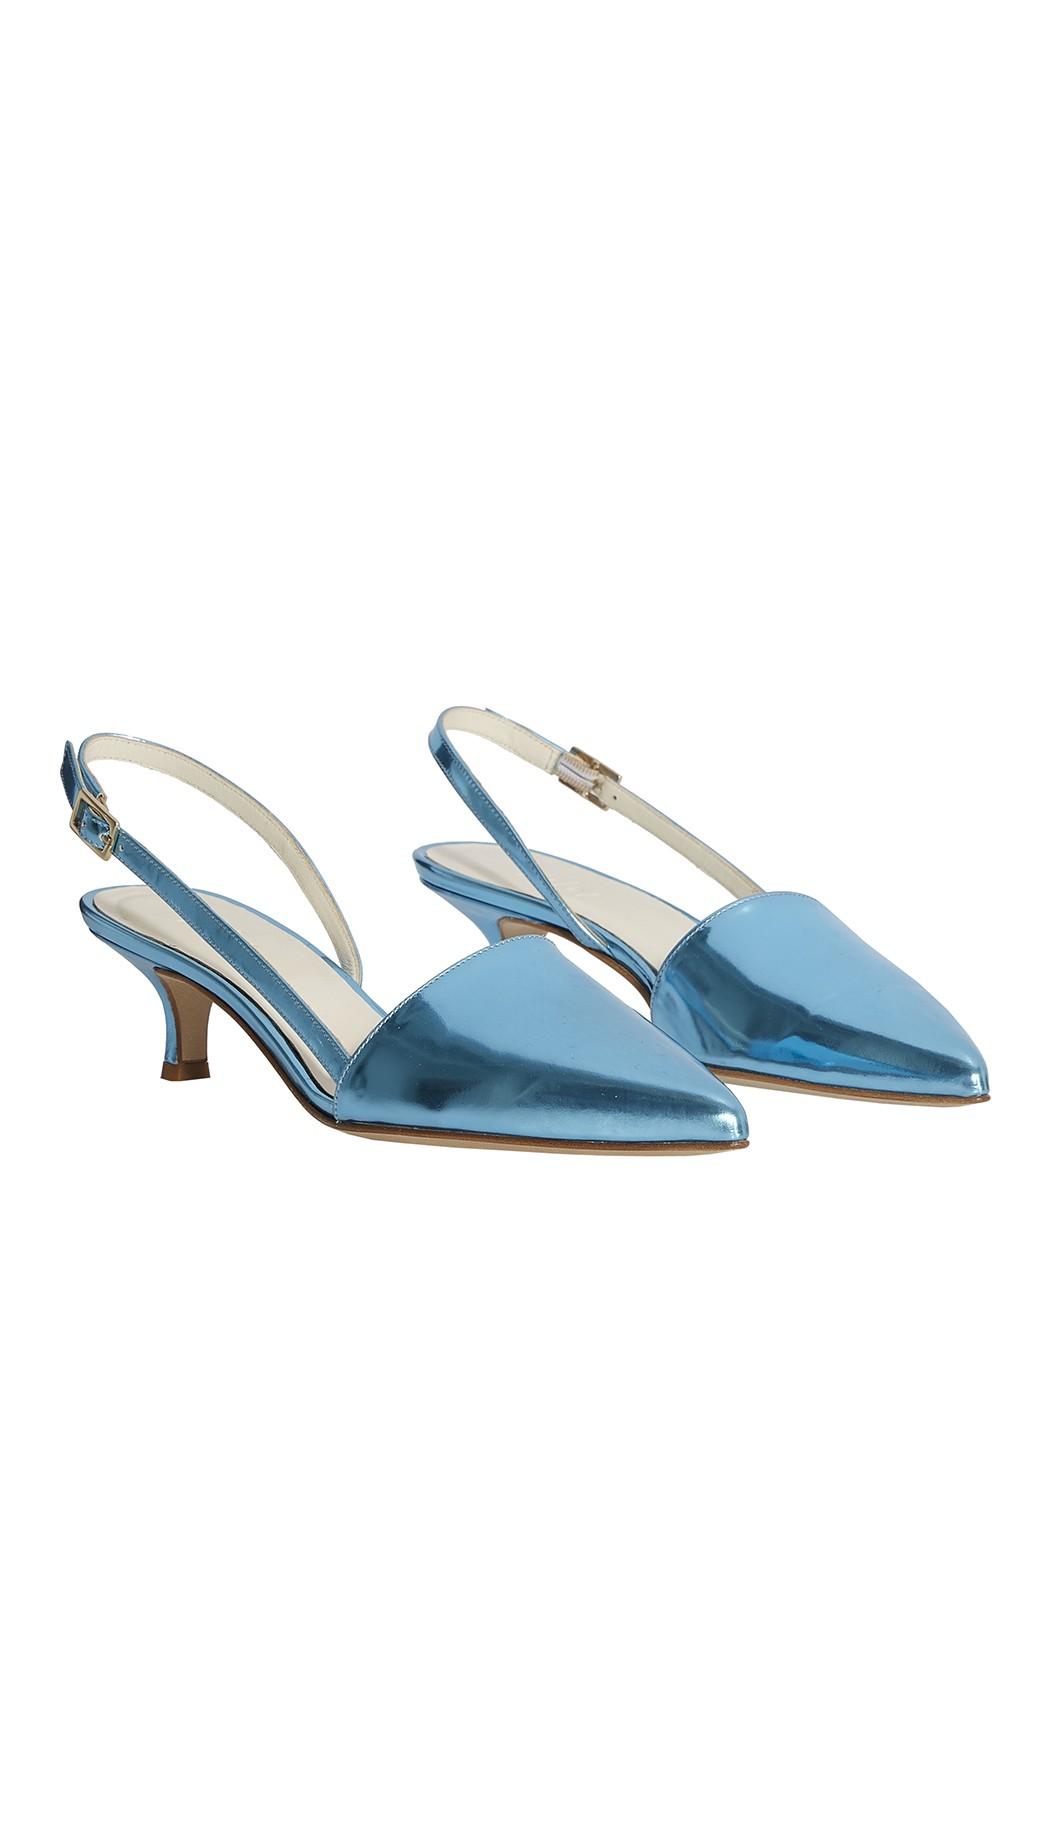 193499c5aef Tibi Simon Heels - 36 Blue